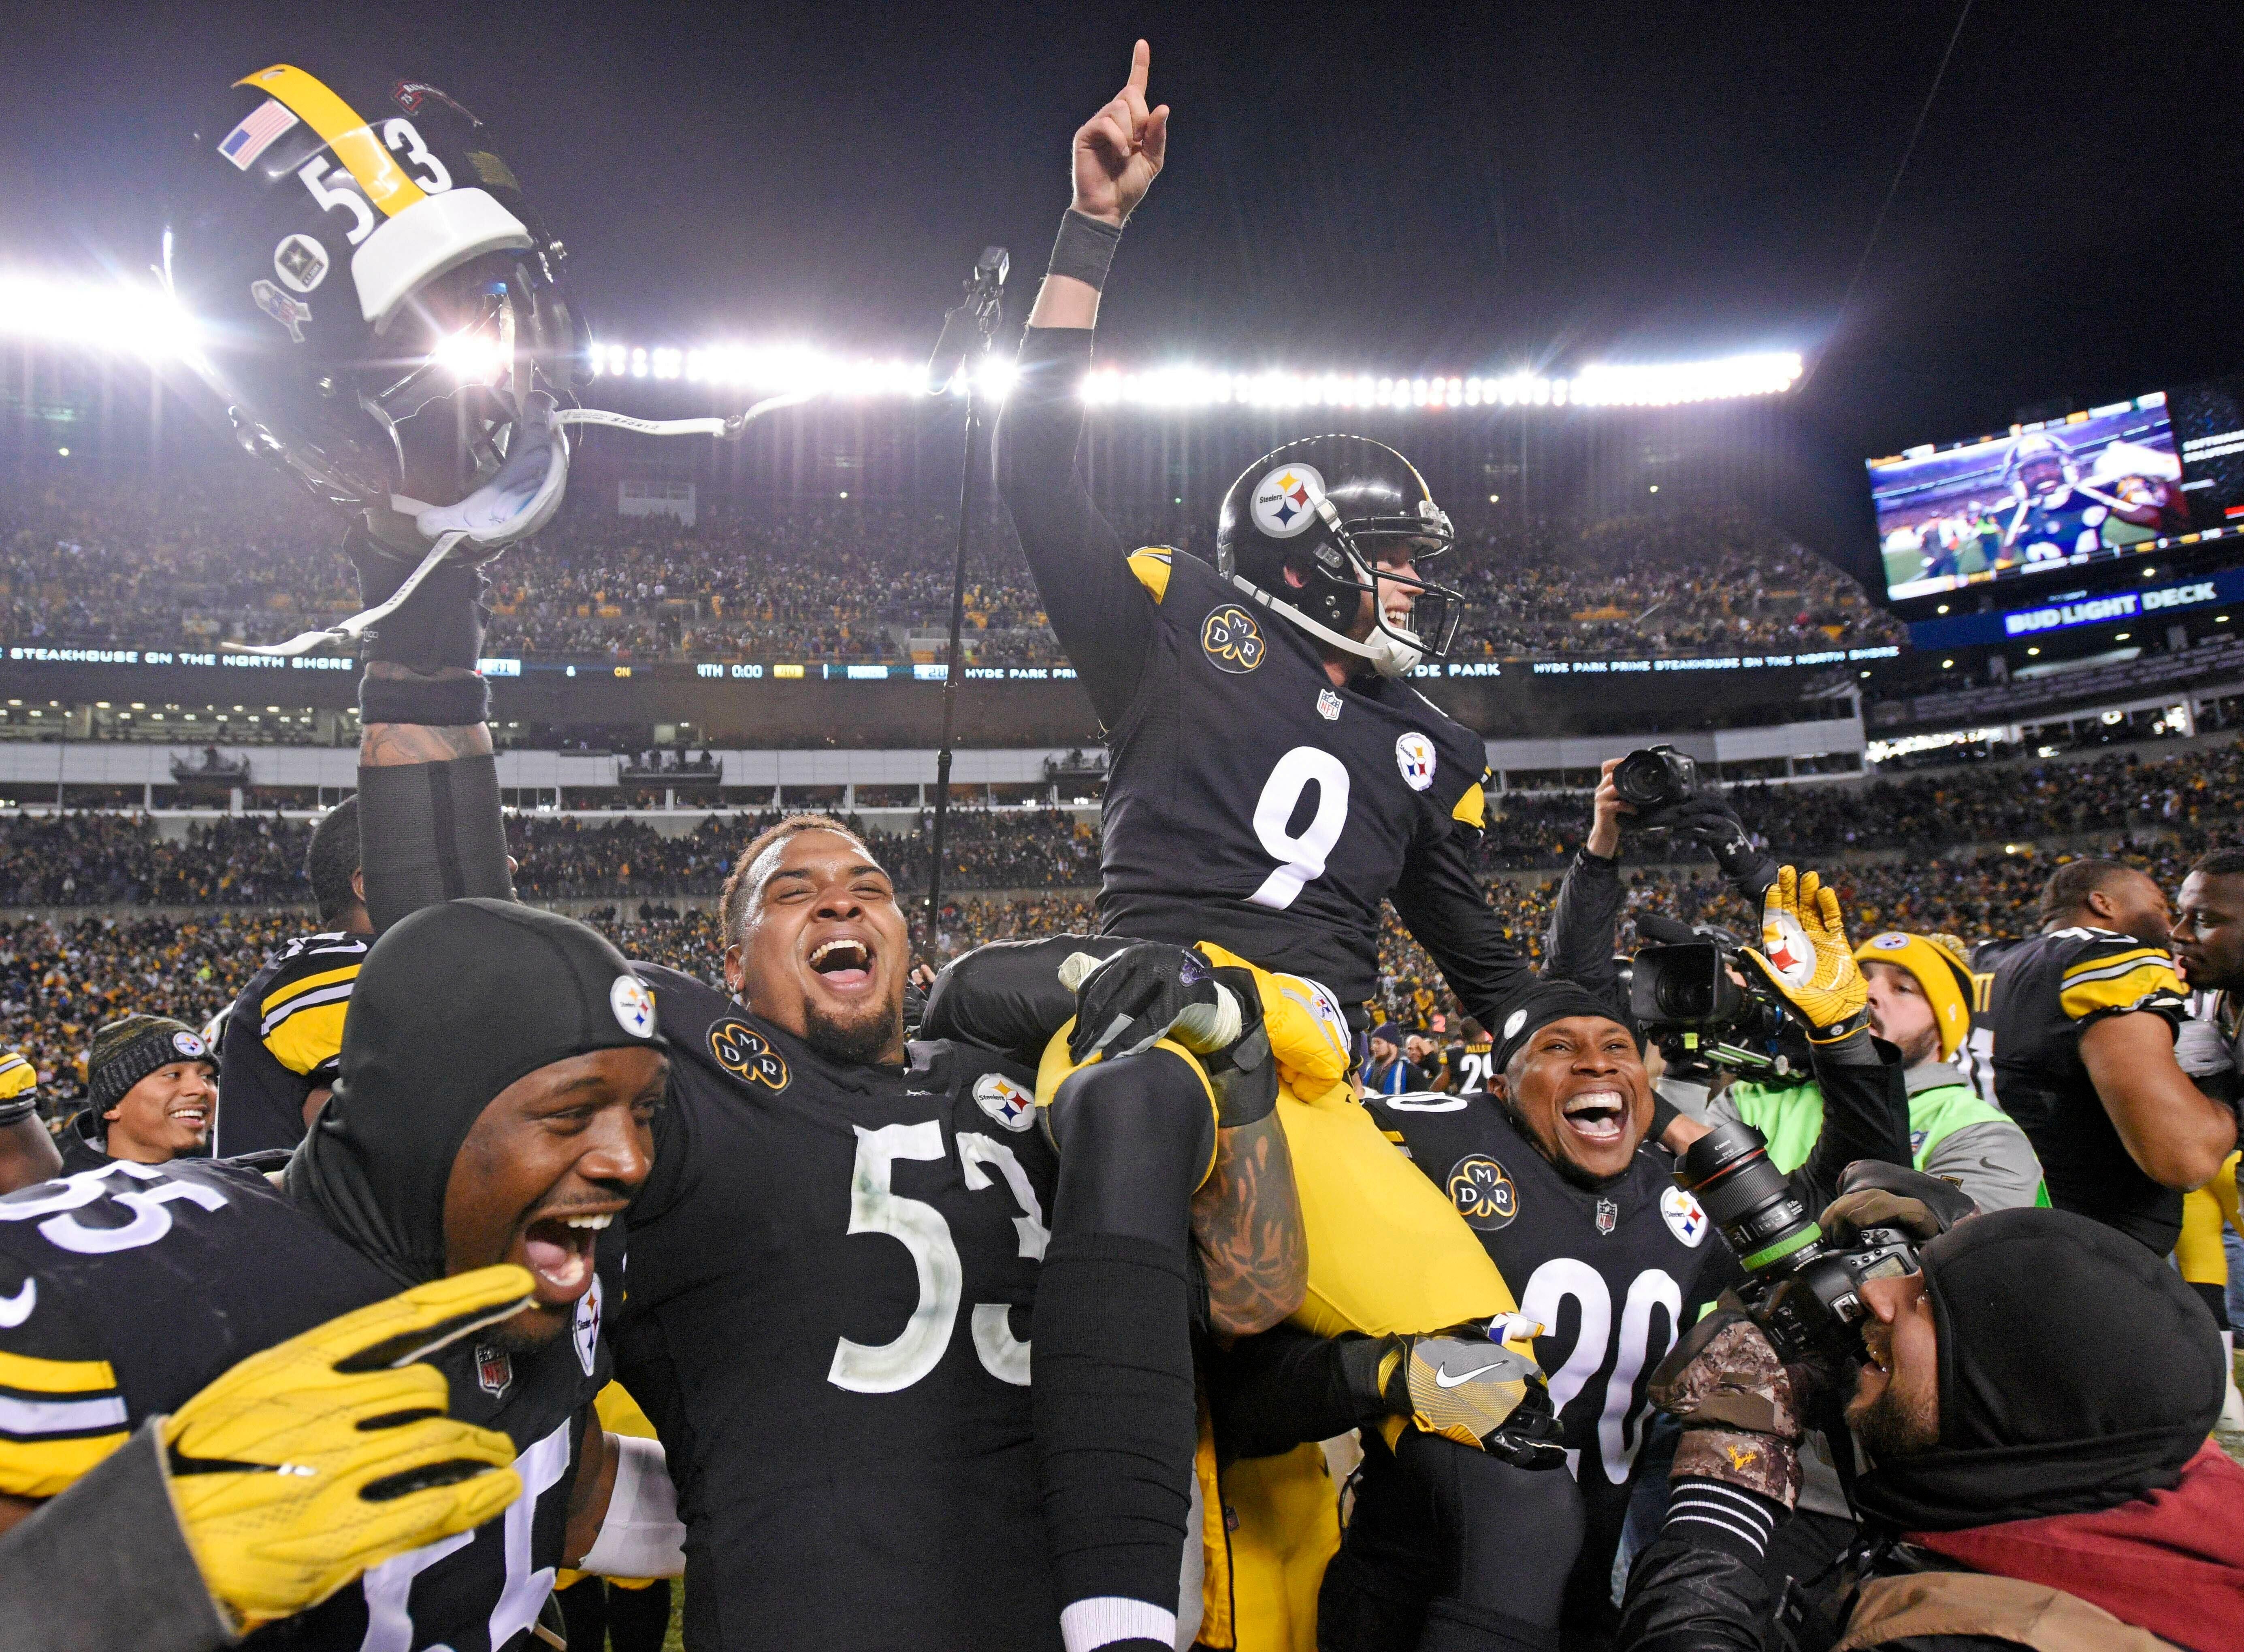 Bounce-back Boz? Steelers' Boswell aims past bumpy kicks